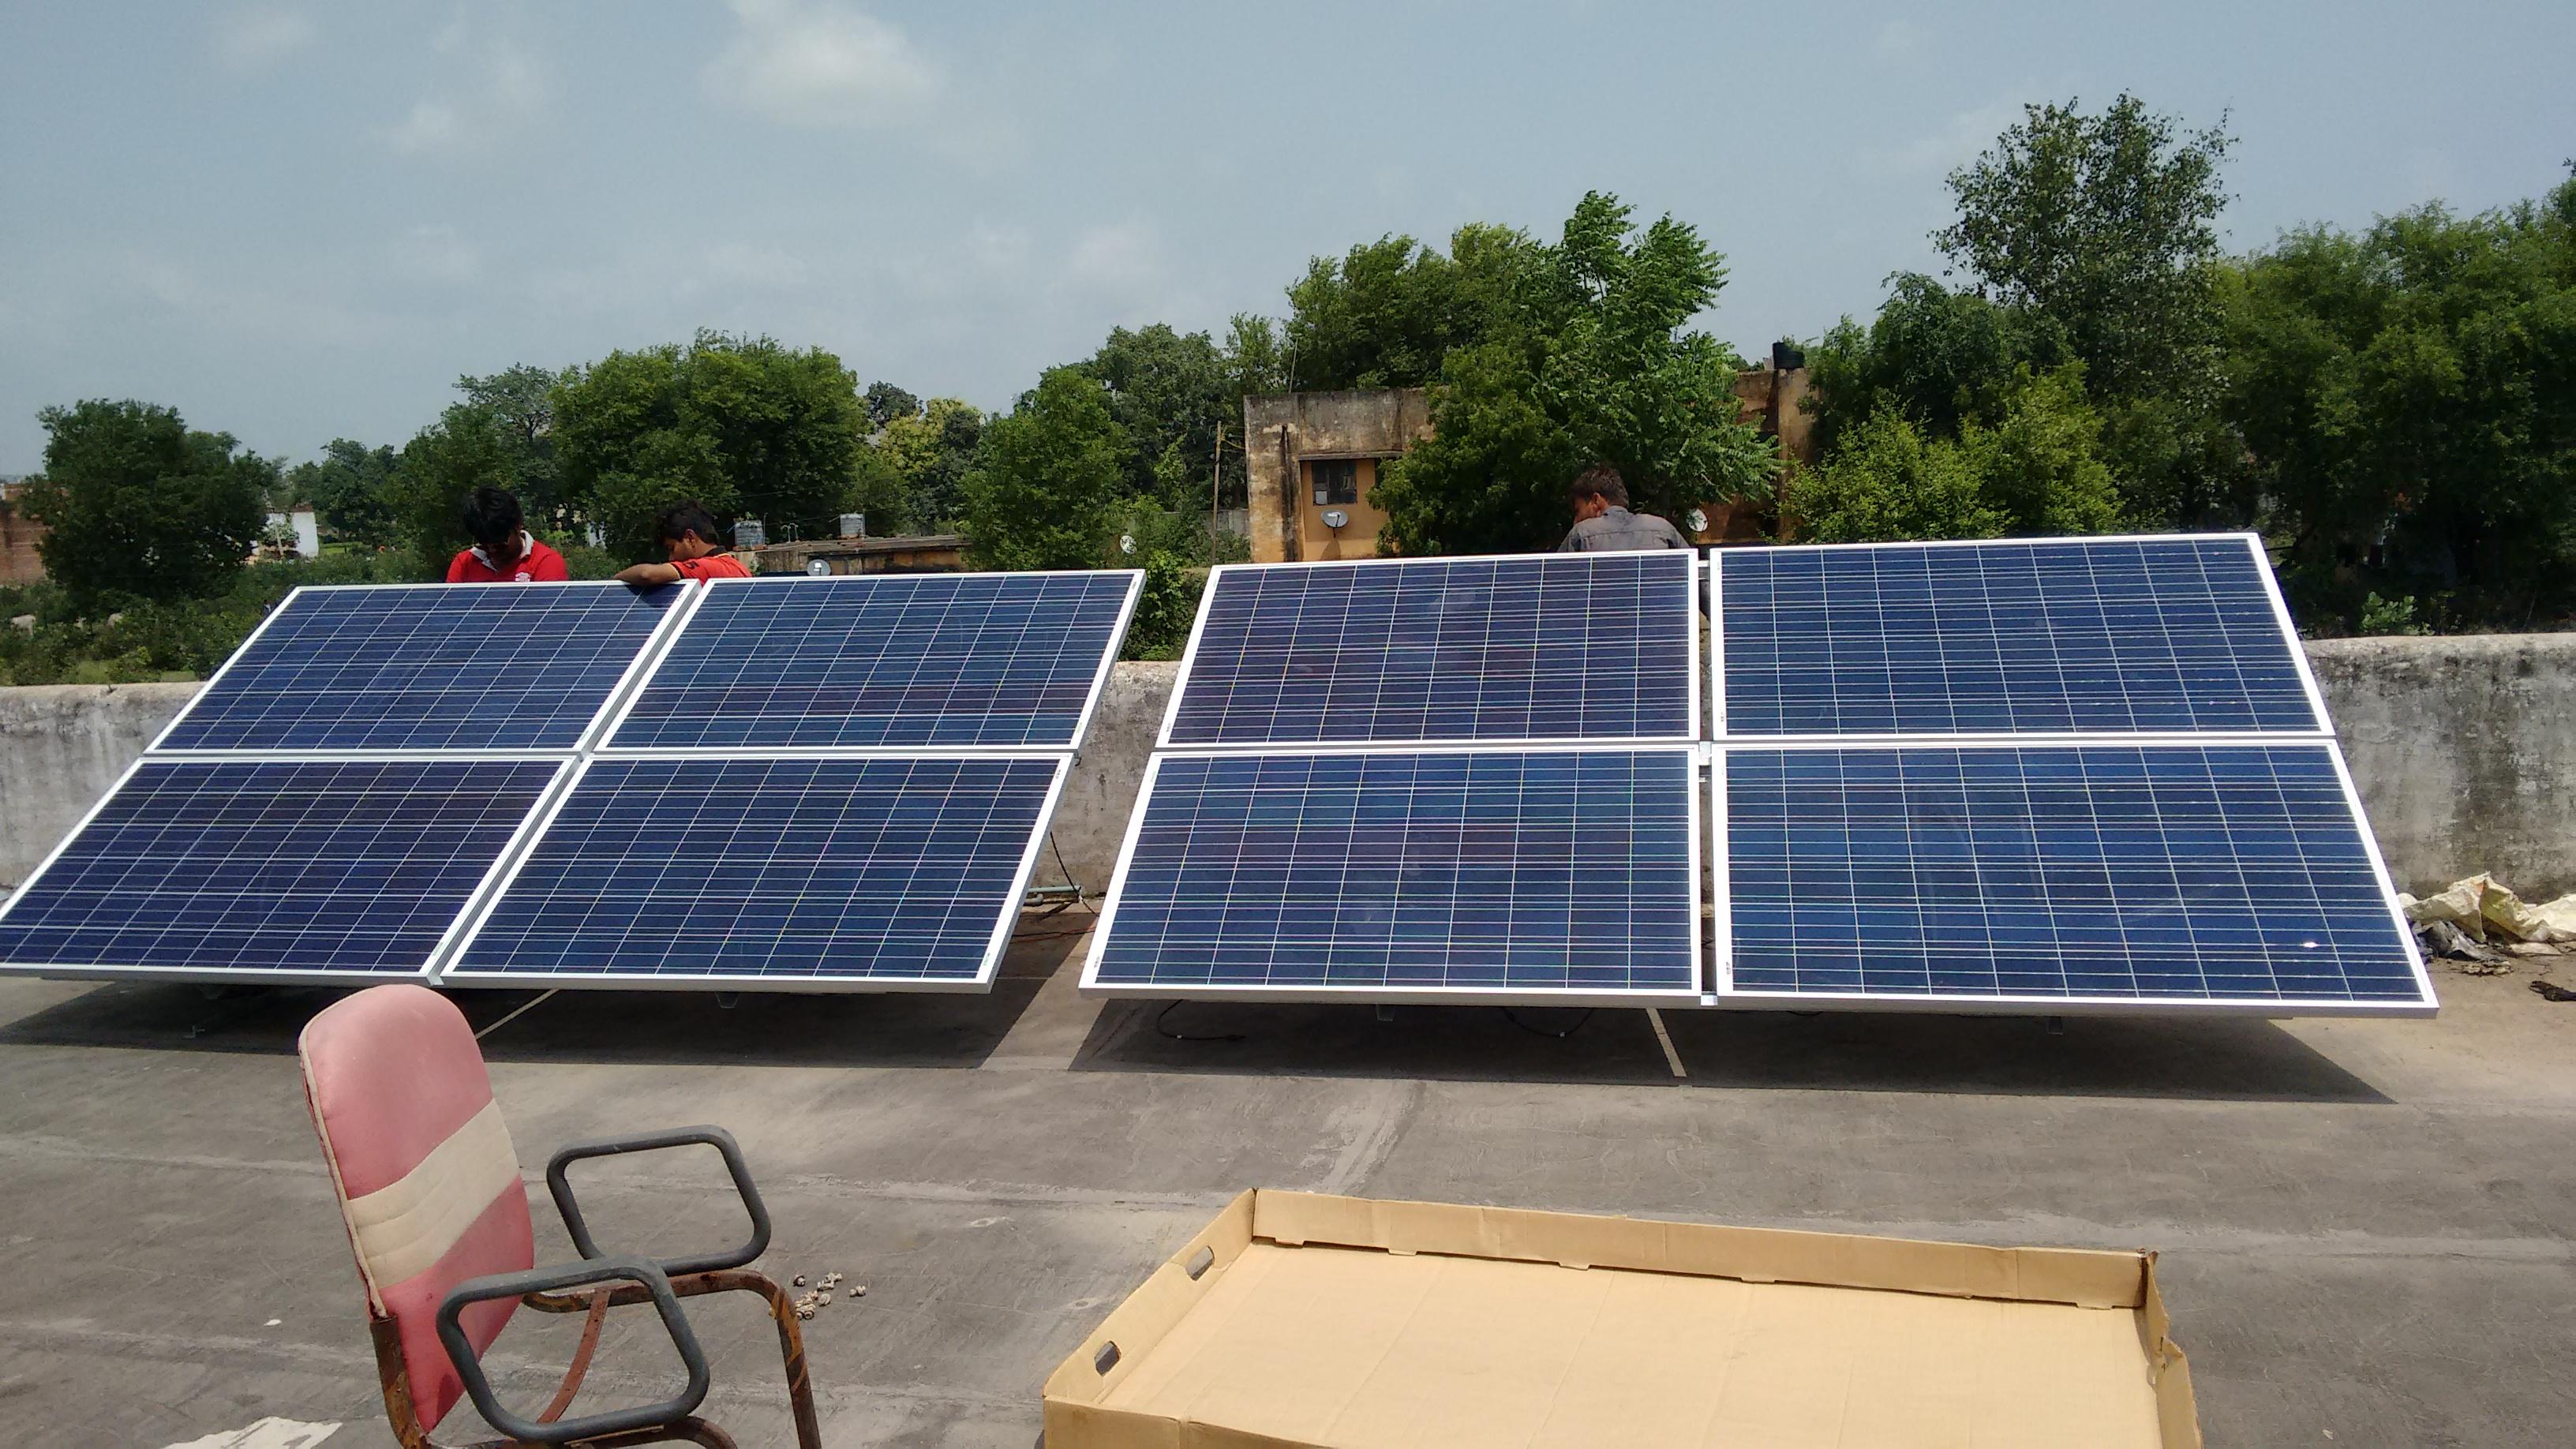 aedei太阳能站点访问图像